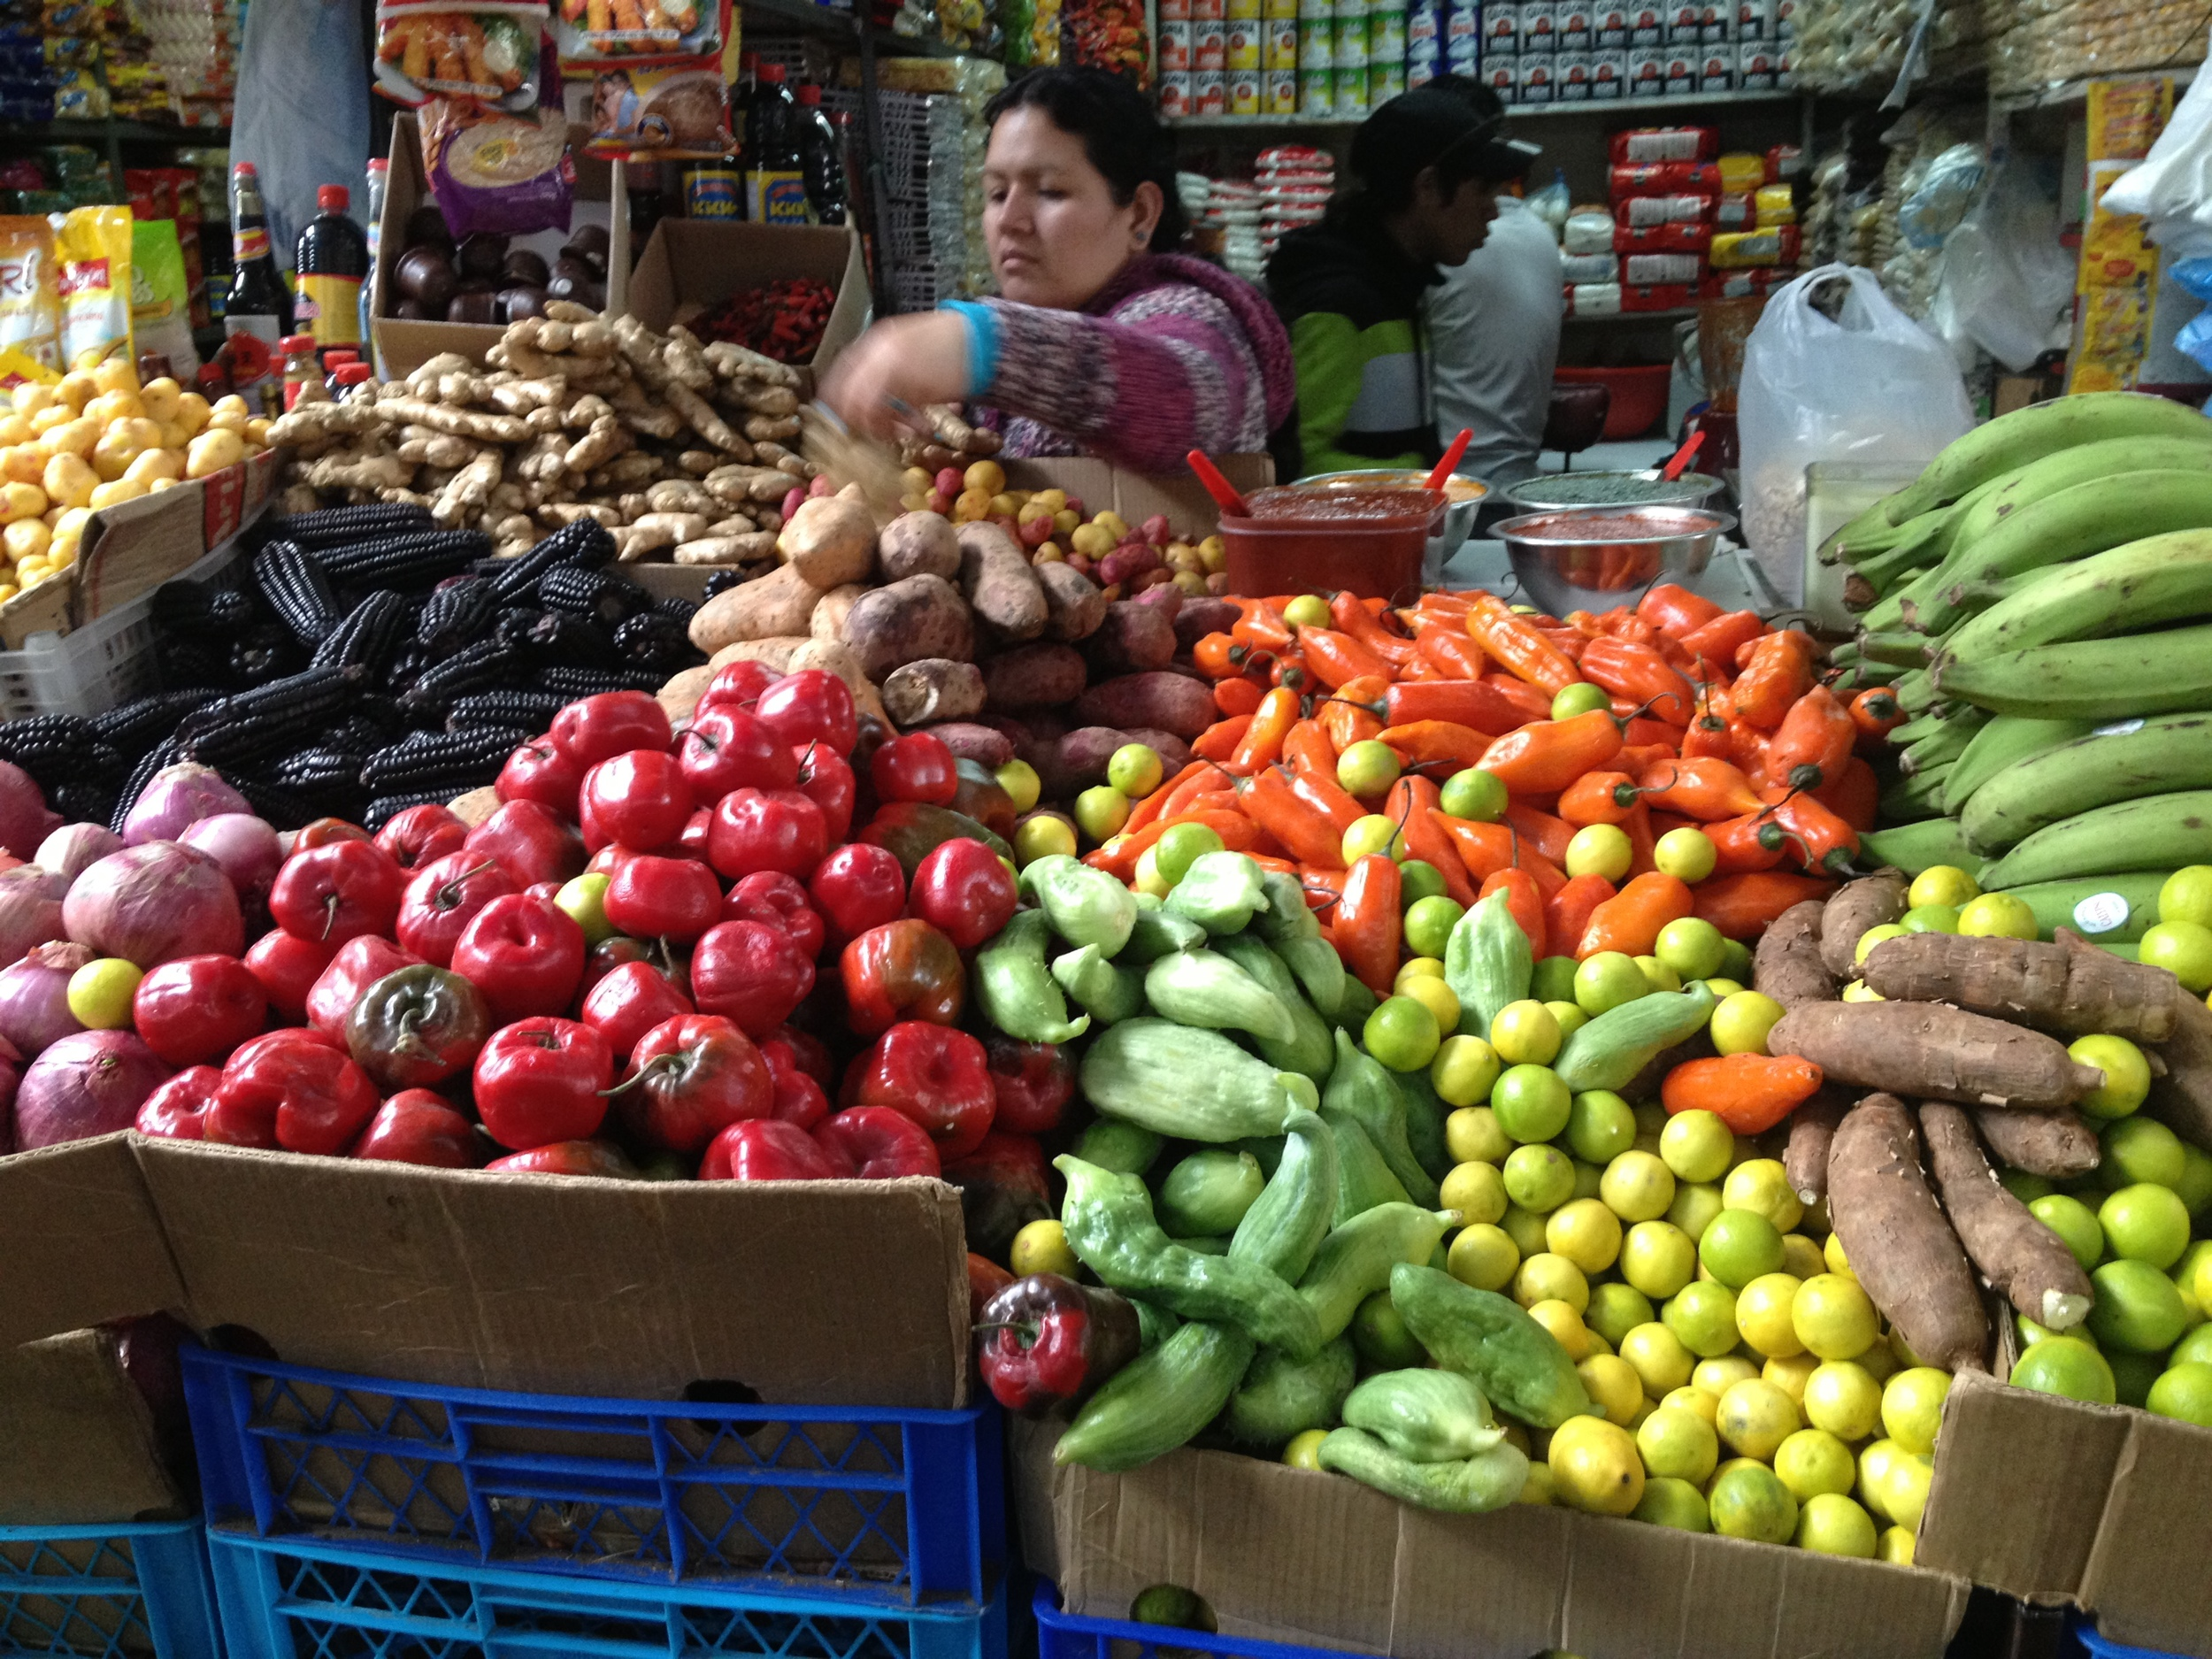 Vega Central market